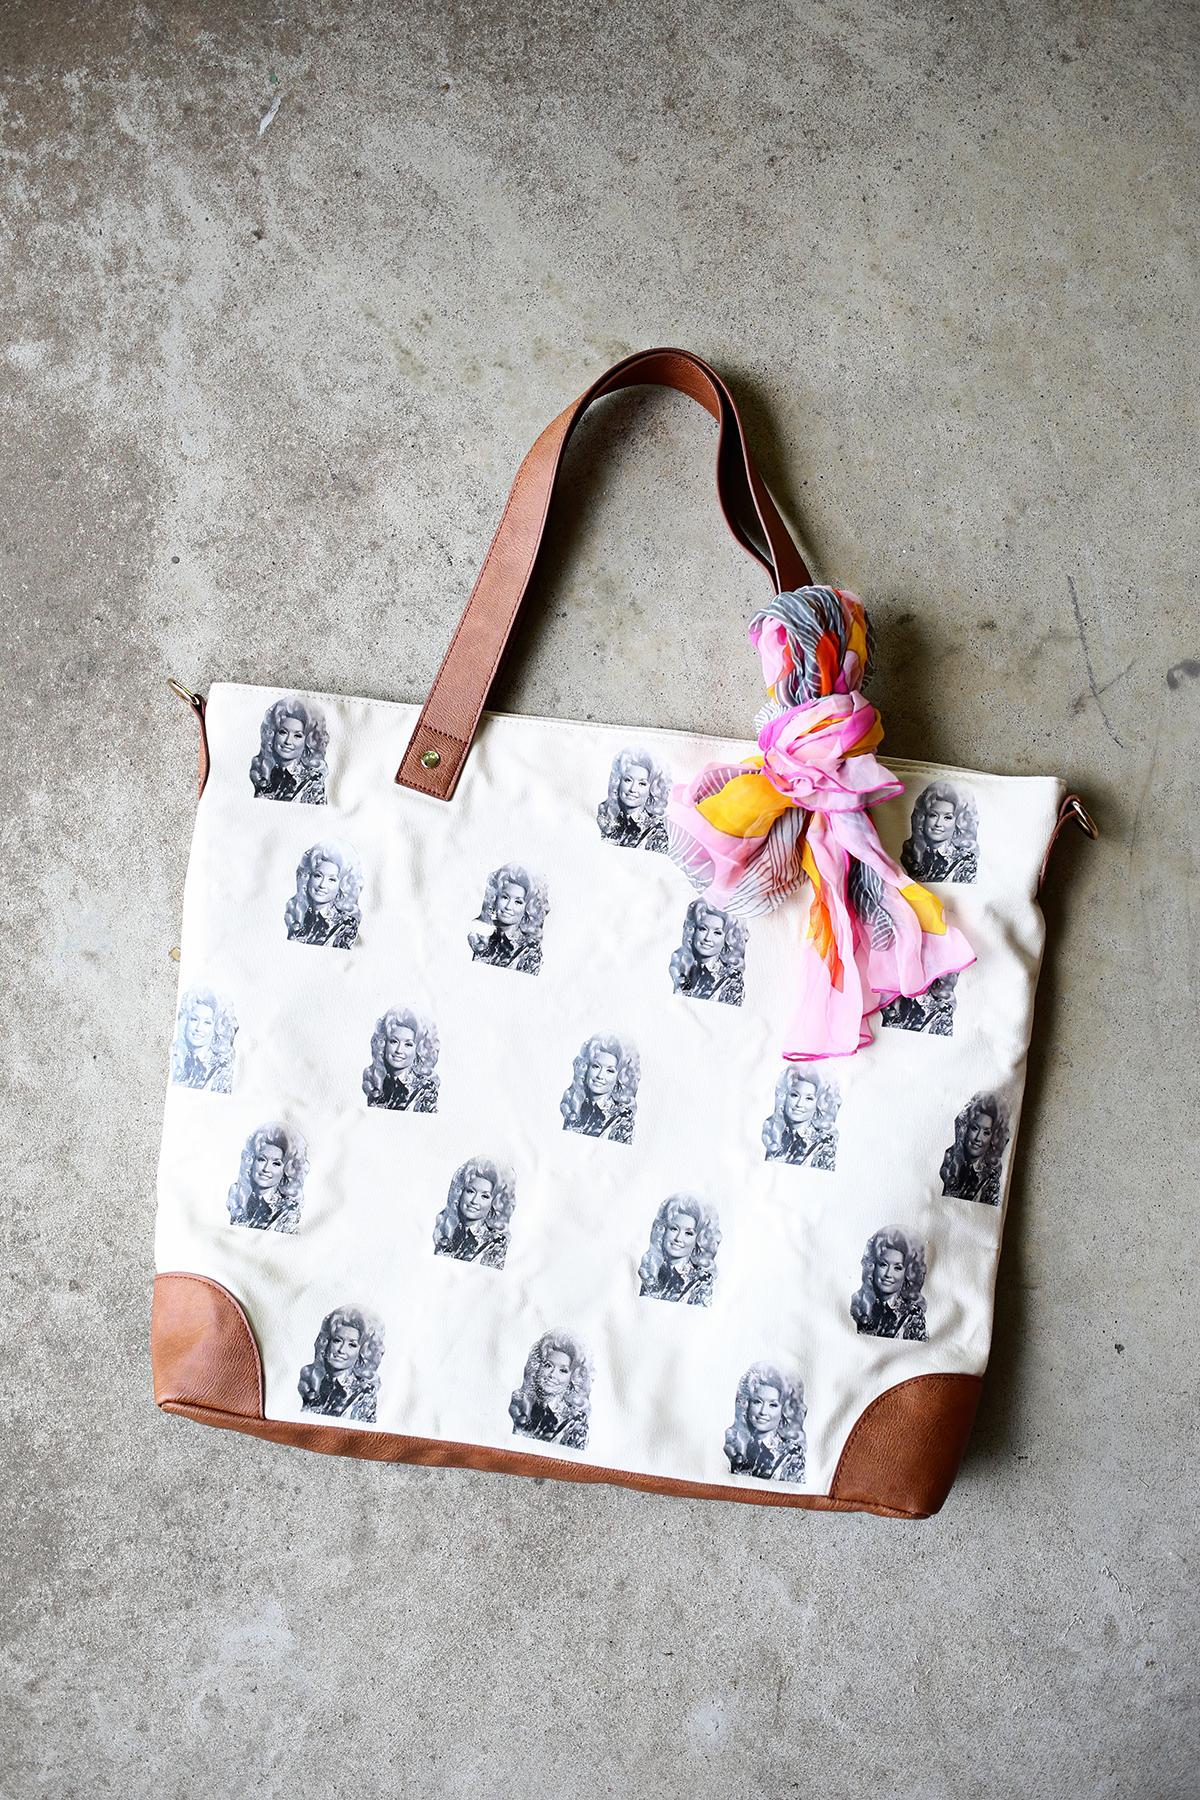 15 Last-Minute DIY Gift Ideas! \u2013 A Beautiful Mess